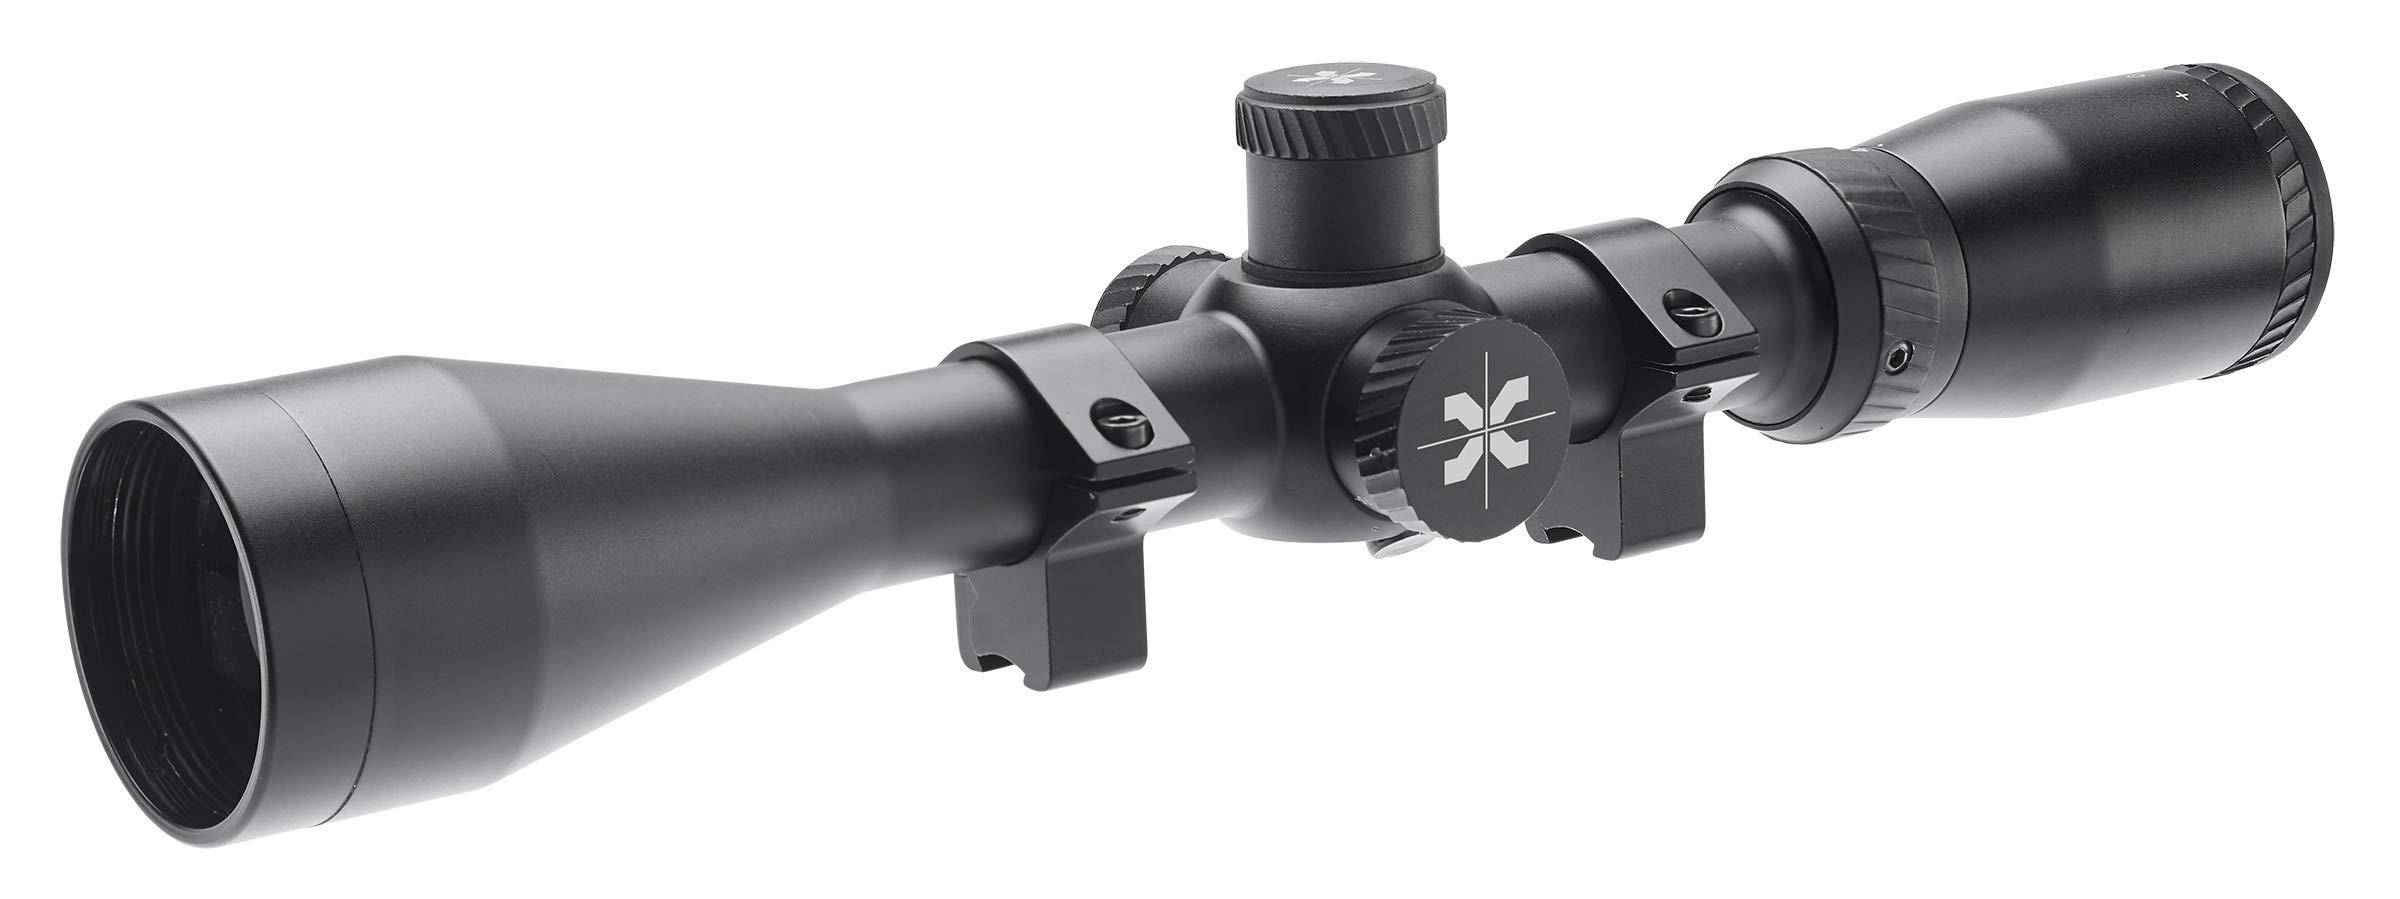 AXEON Optics 4-16x44mm Gauntlet Pellet Gun Air Rifle Scope for Hunting and Target Shooting - Ideal for The Umarex Gauntlet Air Gun, Black